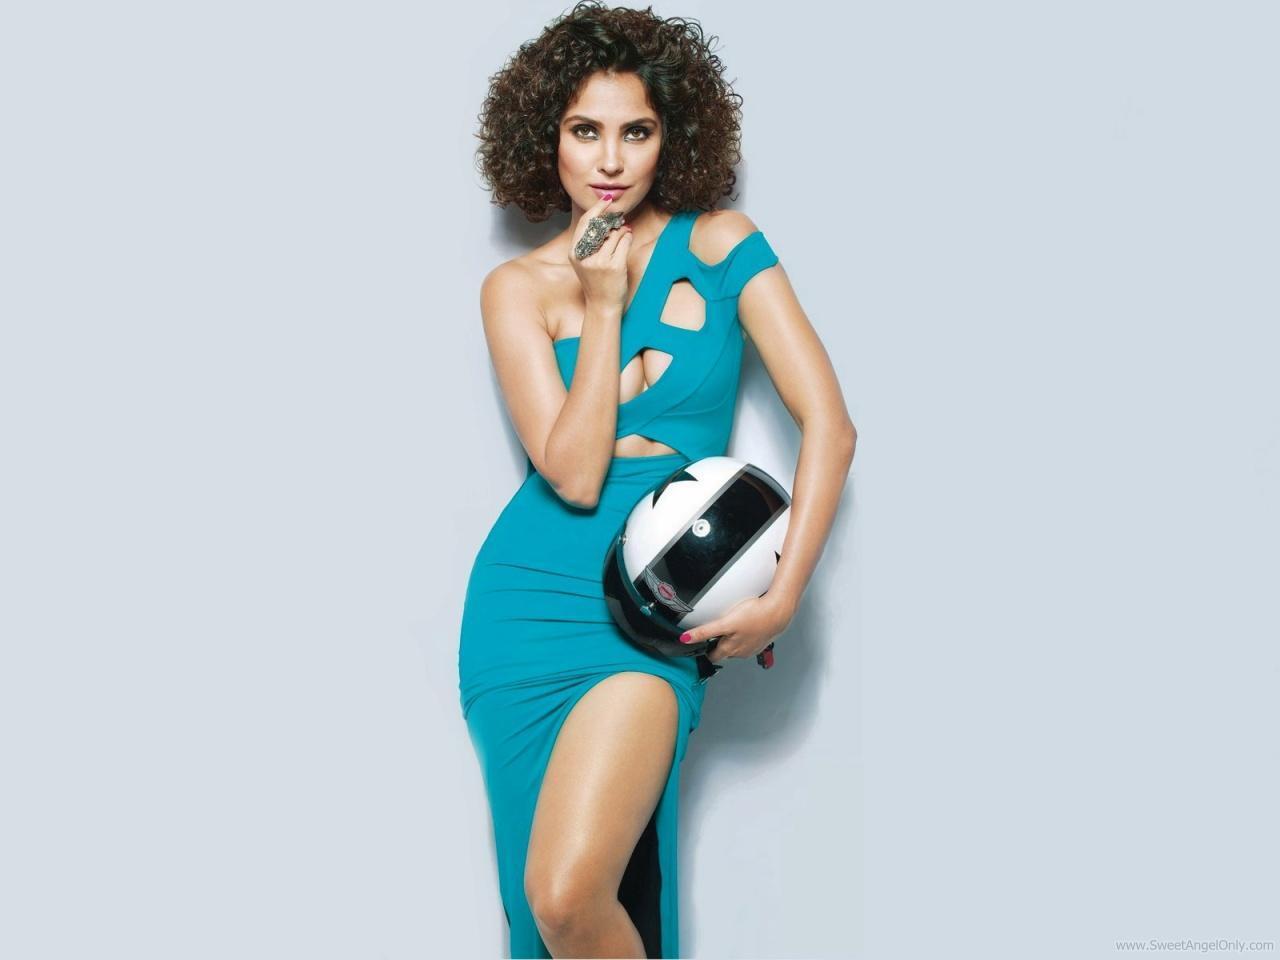 http://2.bp.blogspot.com/-sBAMUn2i6O8/ToB9slo1wuI/AAAAAAAAIvg/1TdJE4Sjl2M/s1600/lara_dutta_bollywood_actress_wallpaper-1280x960.jpg